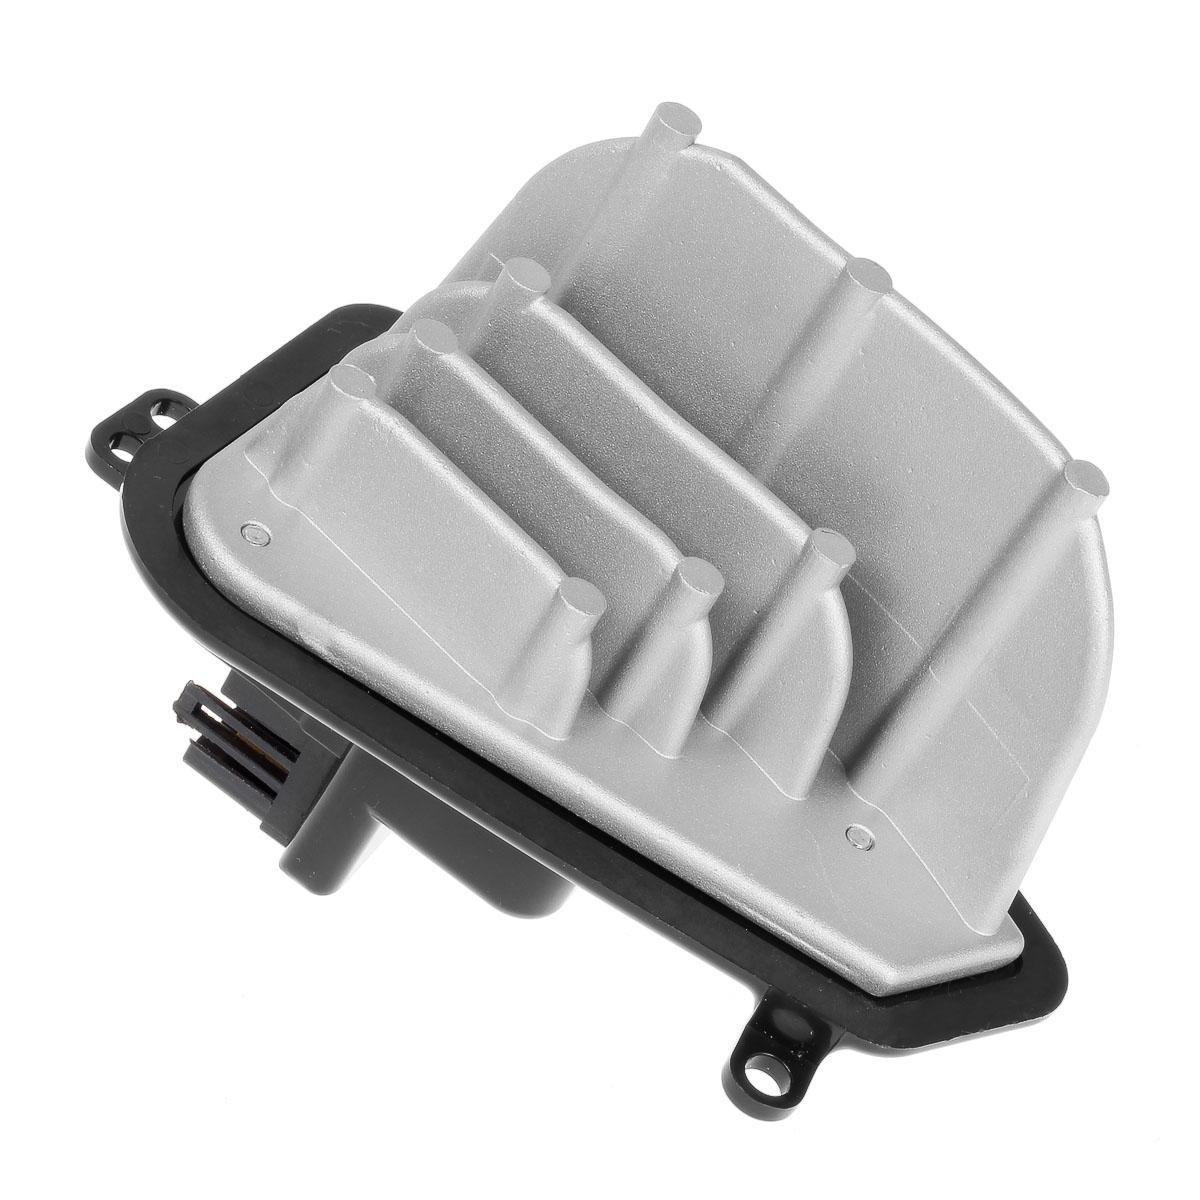 PartsSquare Blower Motor Resistor Control Module RU378 JA1428 3A1332 79330S84A41 Fits for 1998 1999 2000 2001 2002 HONDA Accord 1999 2000 2001 2002 2003 2004 Honda Odyssey 3.5L-V6